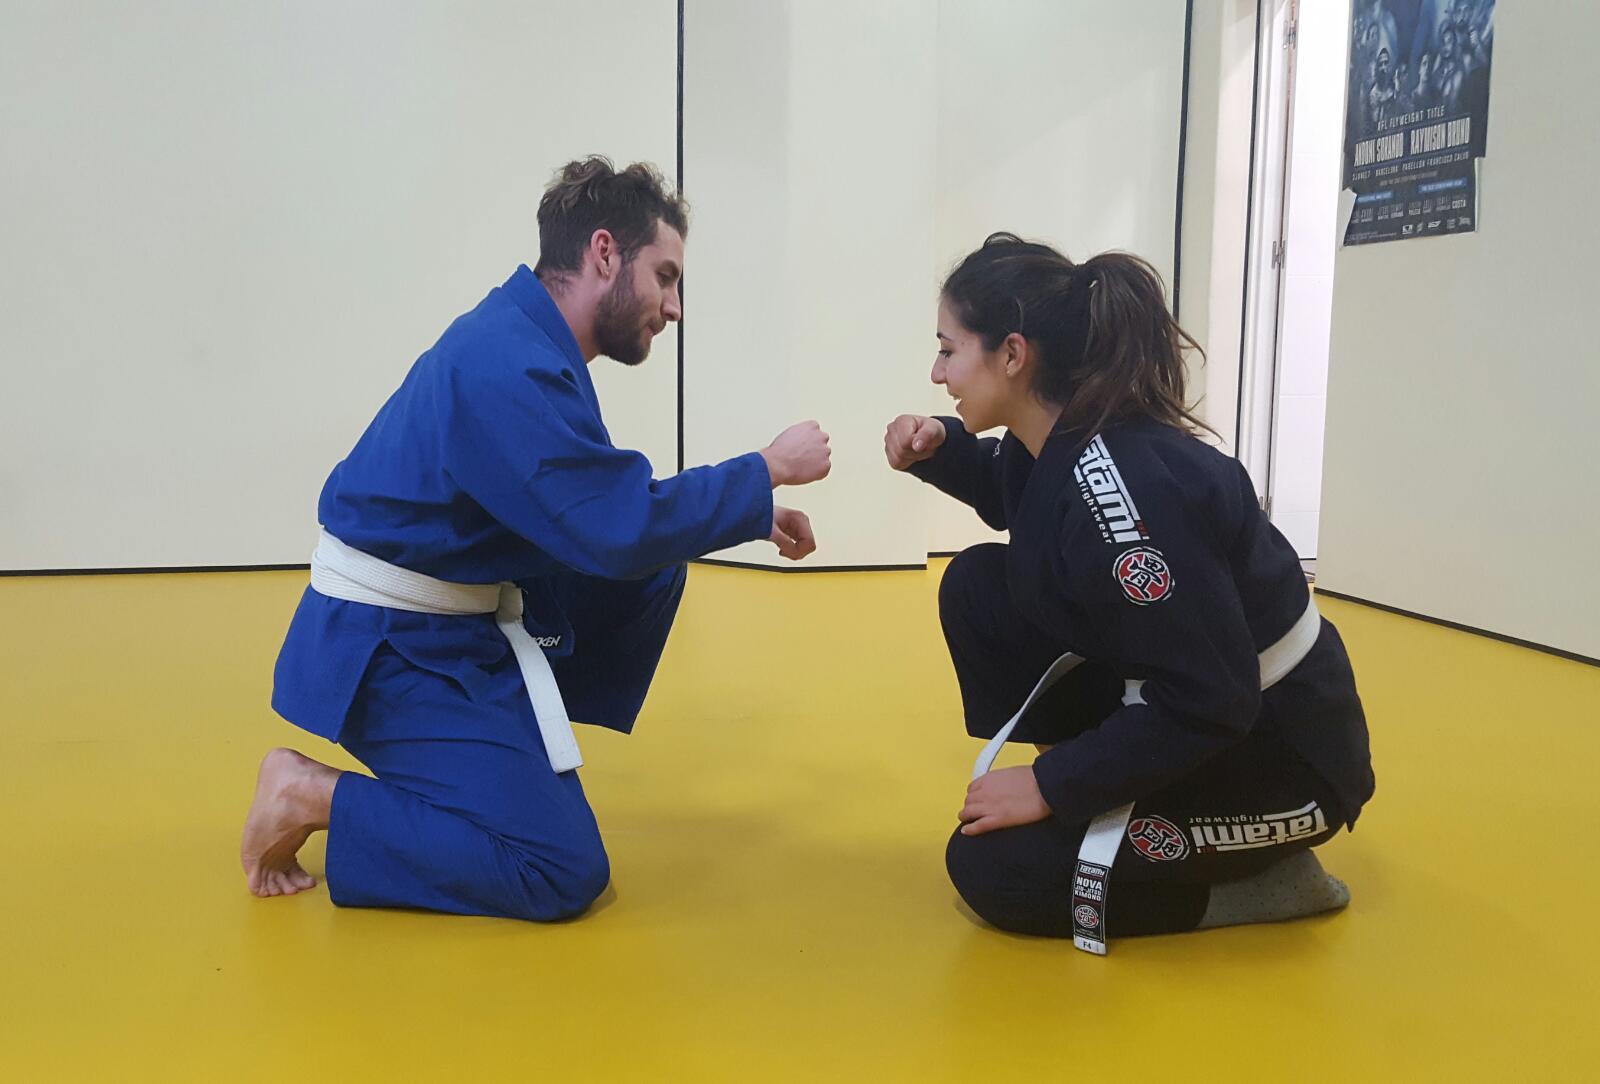 chica y chico practicando jiu jitsu brasileño